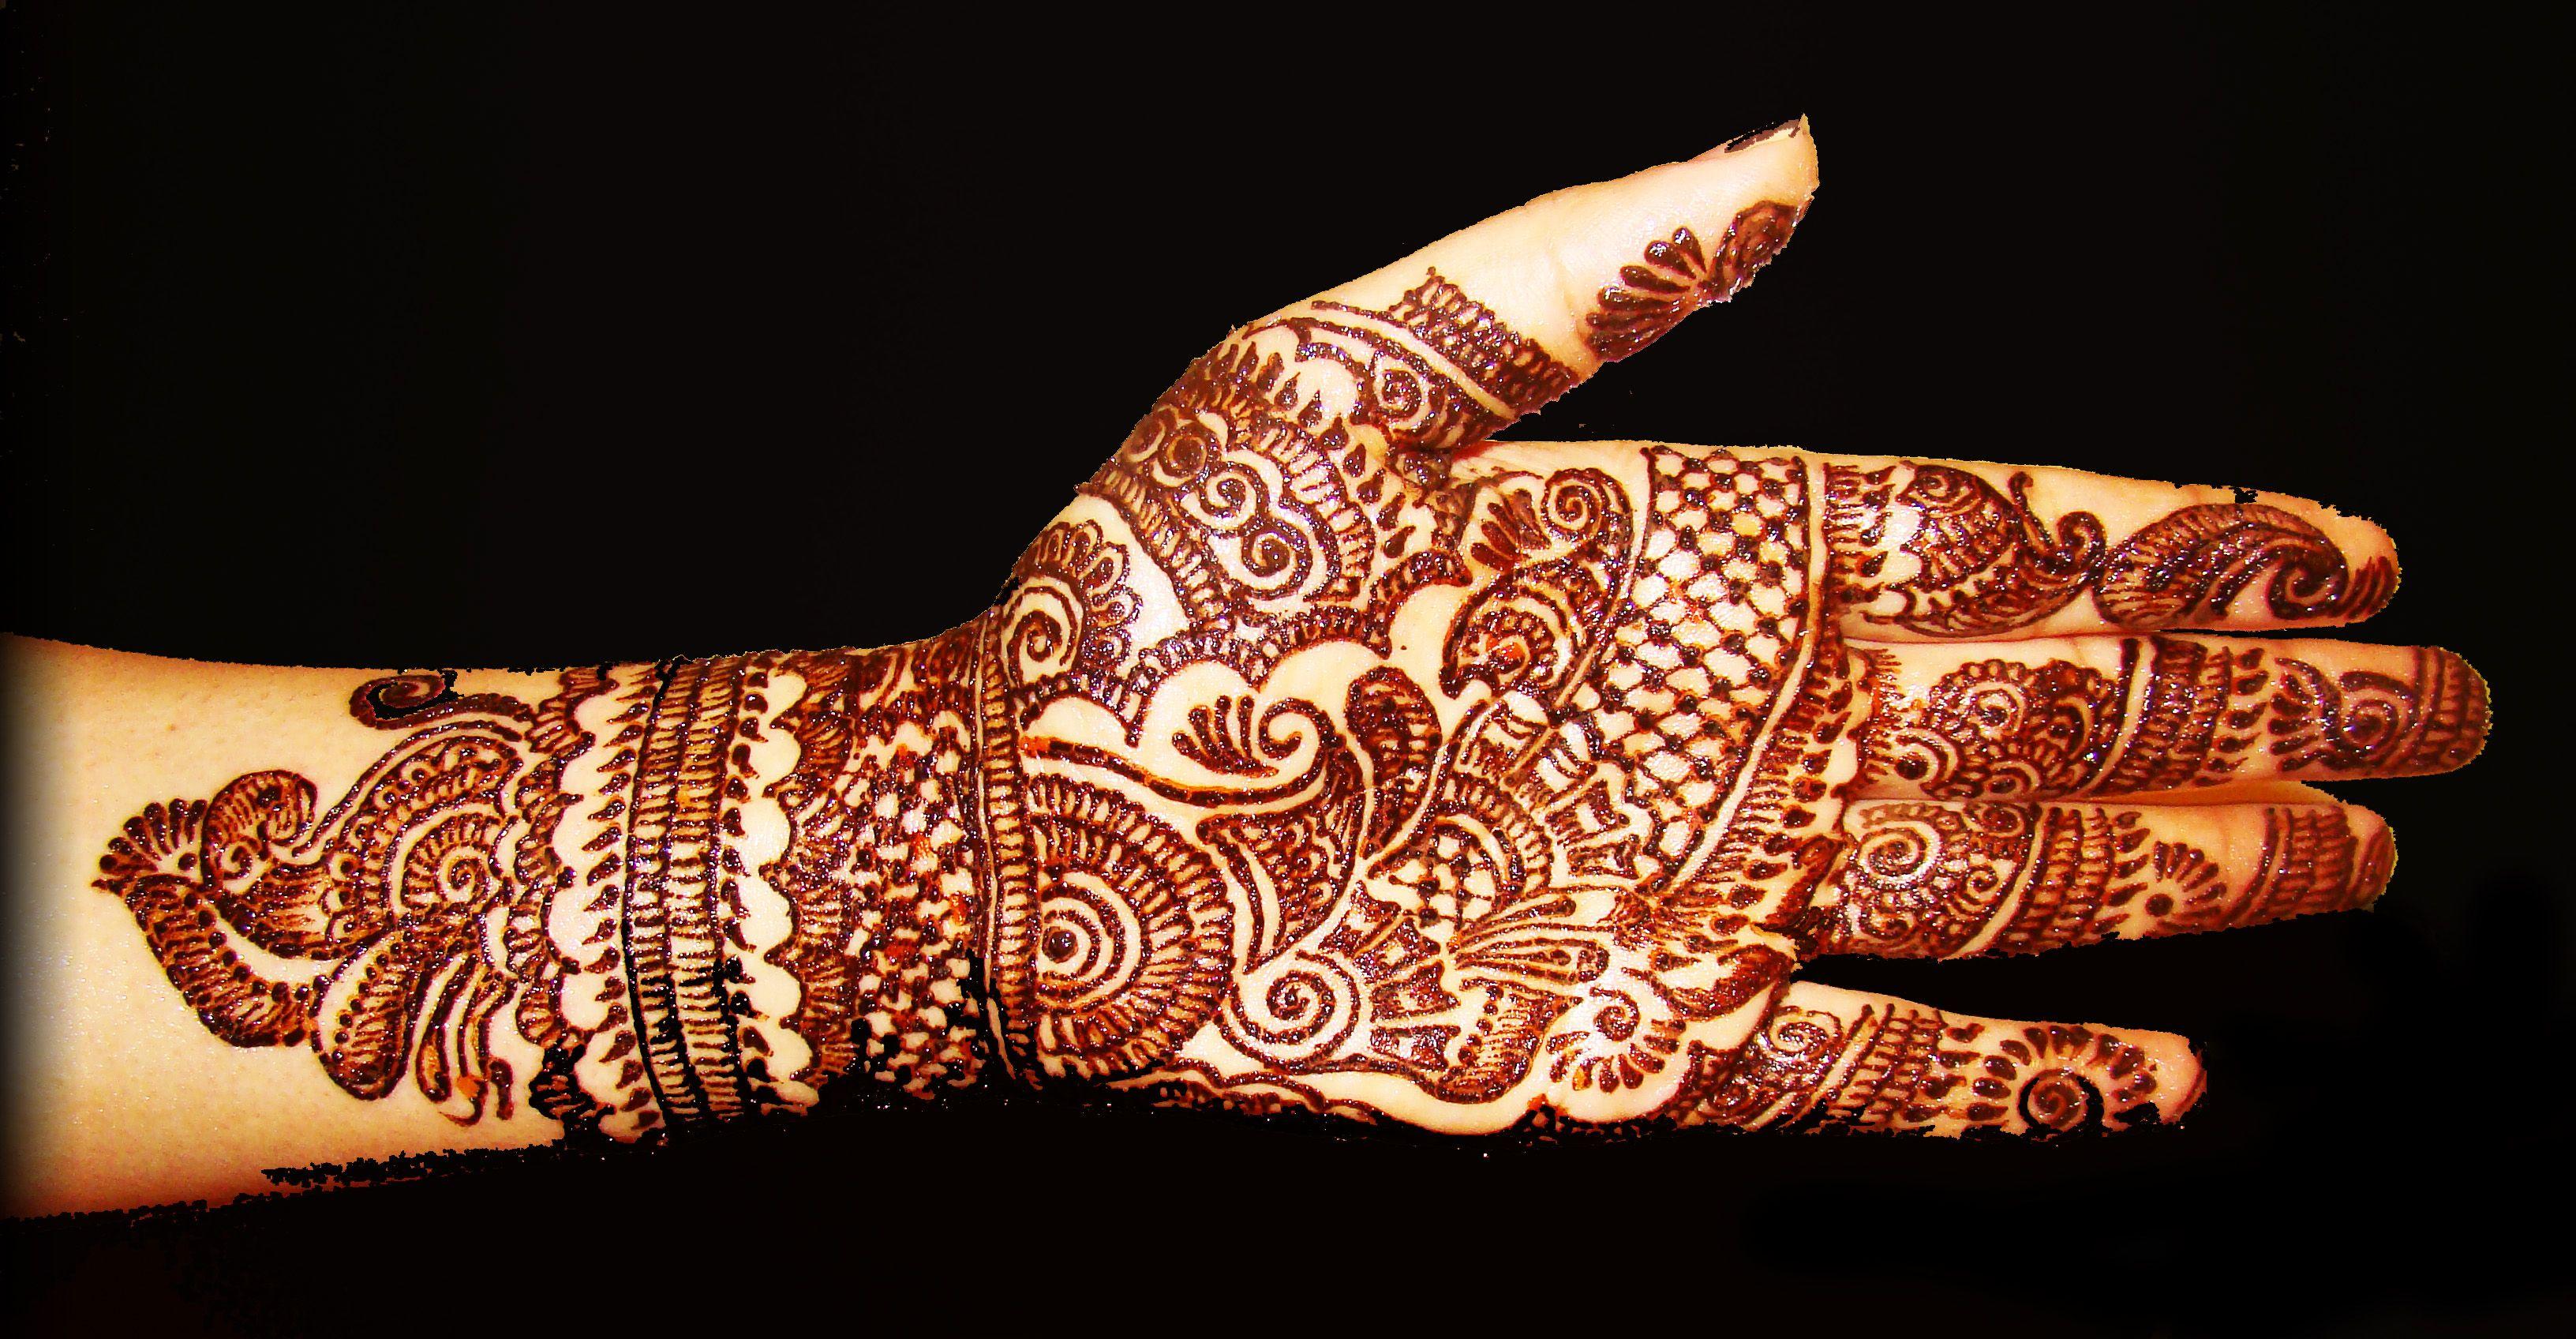 Henna Mehndi Cones Uk : Henna mehndi asian bridal makeup artist birmingham